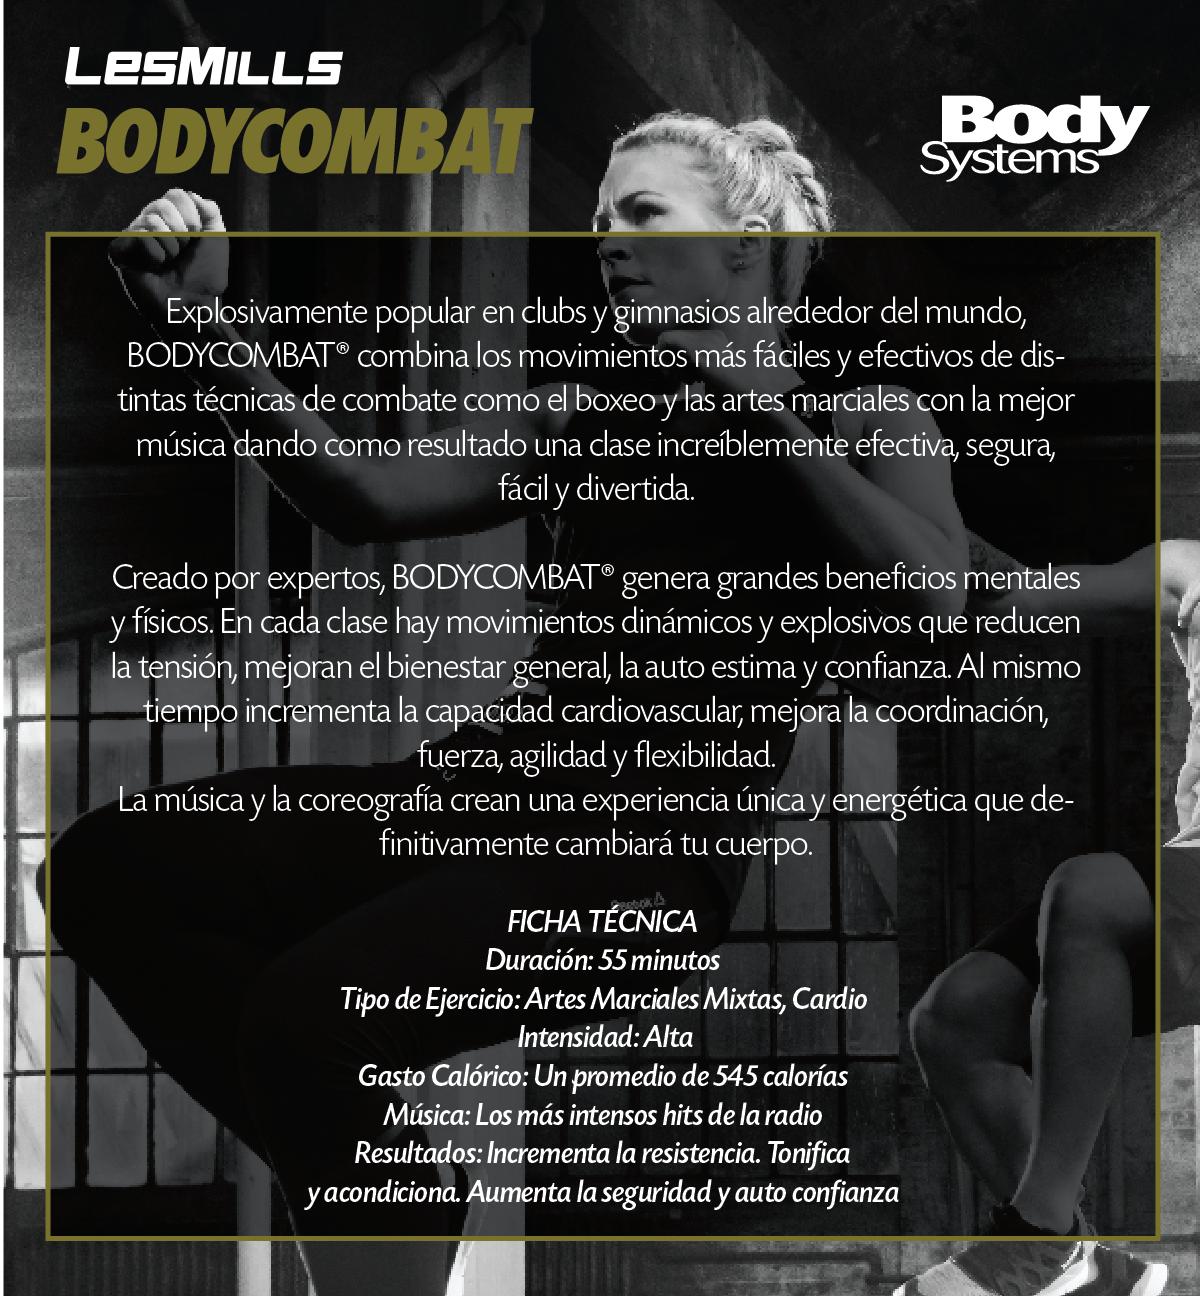 Pin de Body Systems México en Body Systems / Les Mills | Pinterest